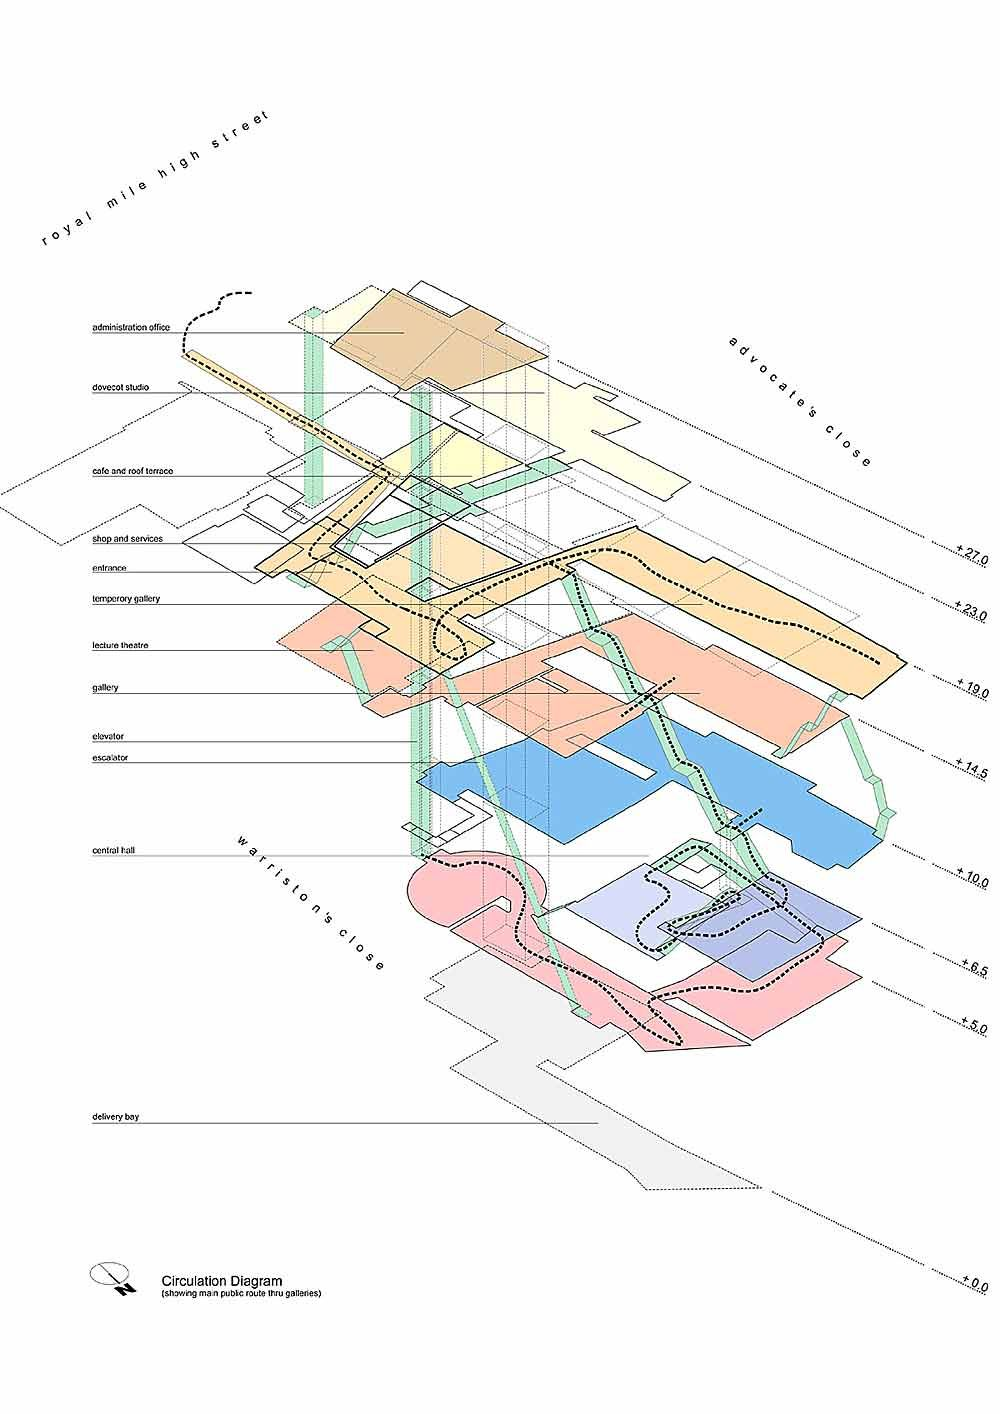 architectural circulation diagram google search arc607 diagram architectural circulation diagram google search [ 1000 x 1414 Pixel ]